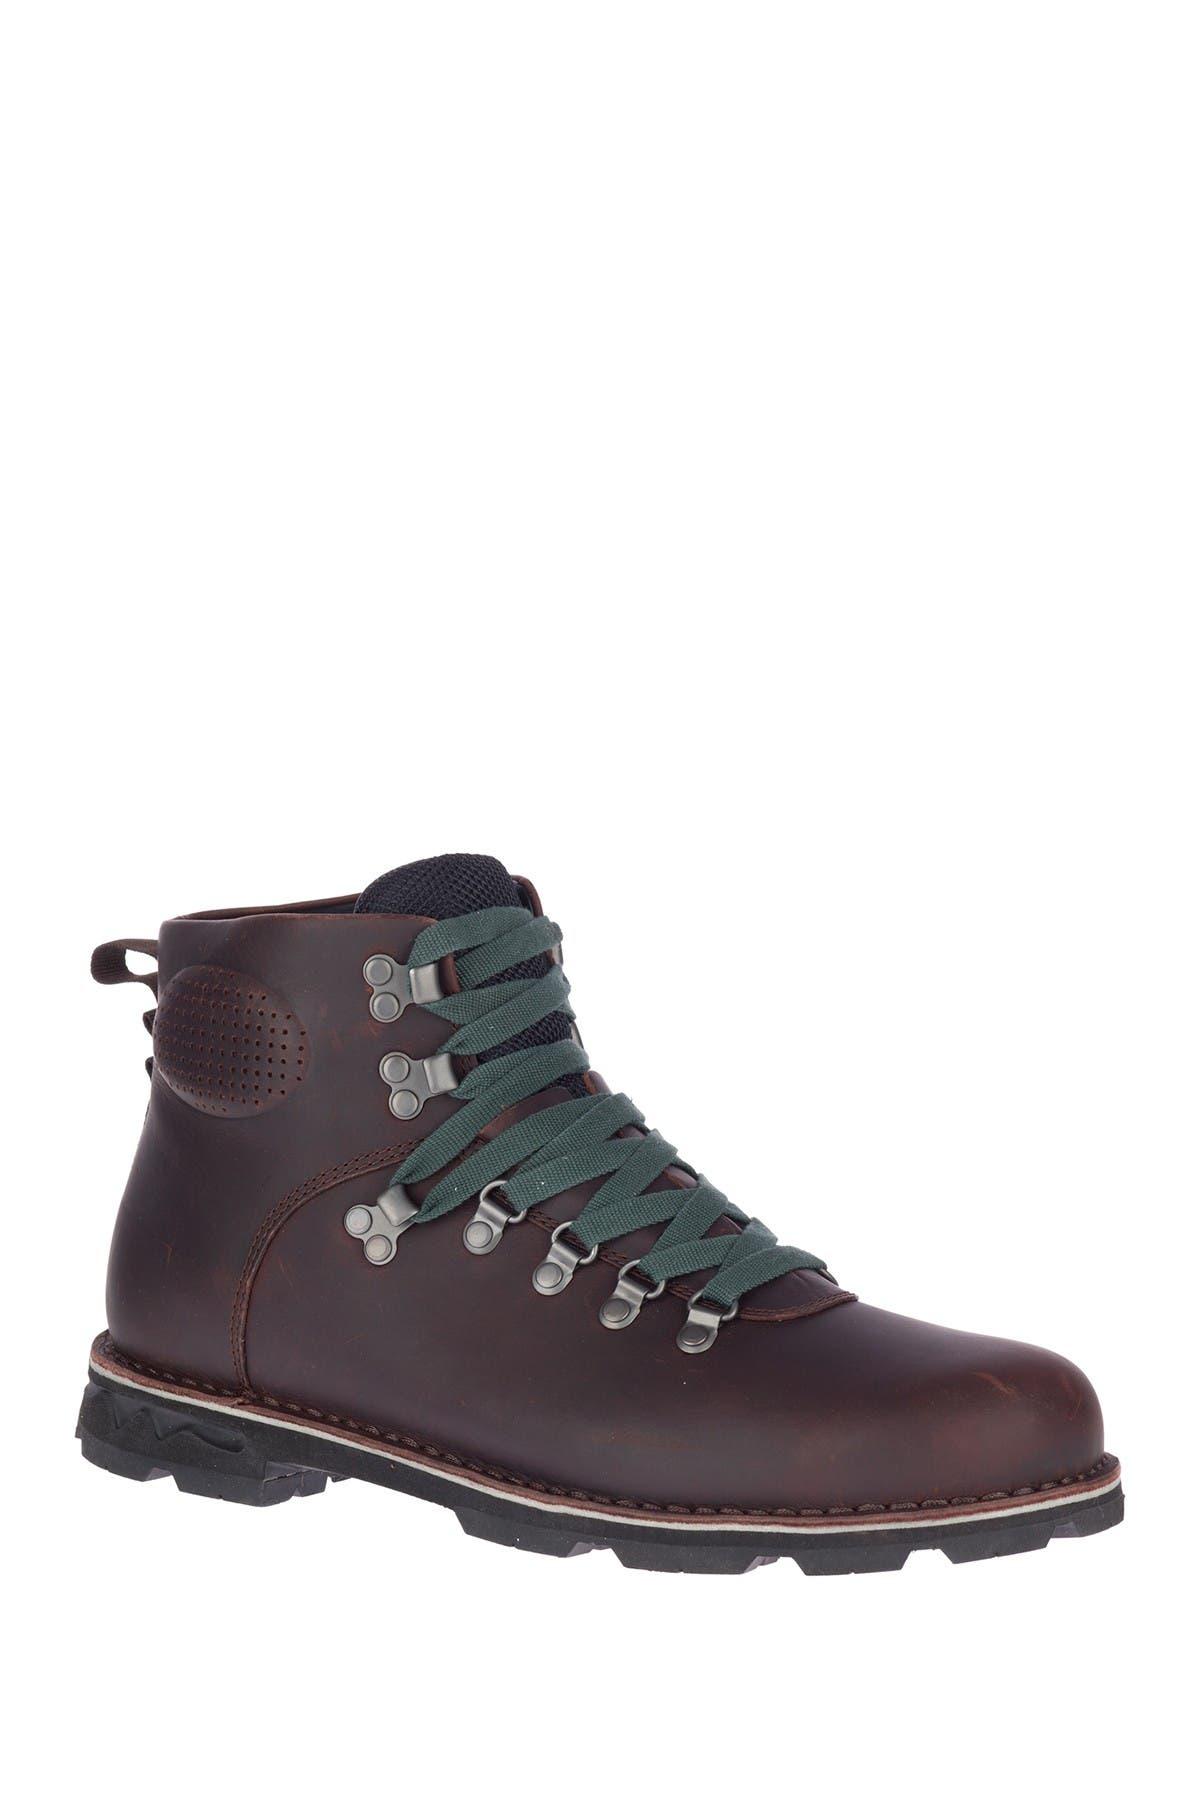 Sugarbush Braden Mid Waterproof Leather